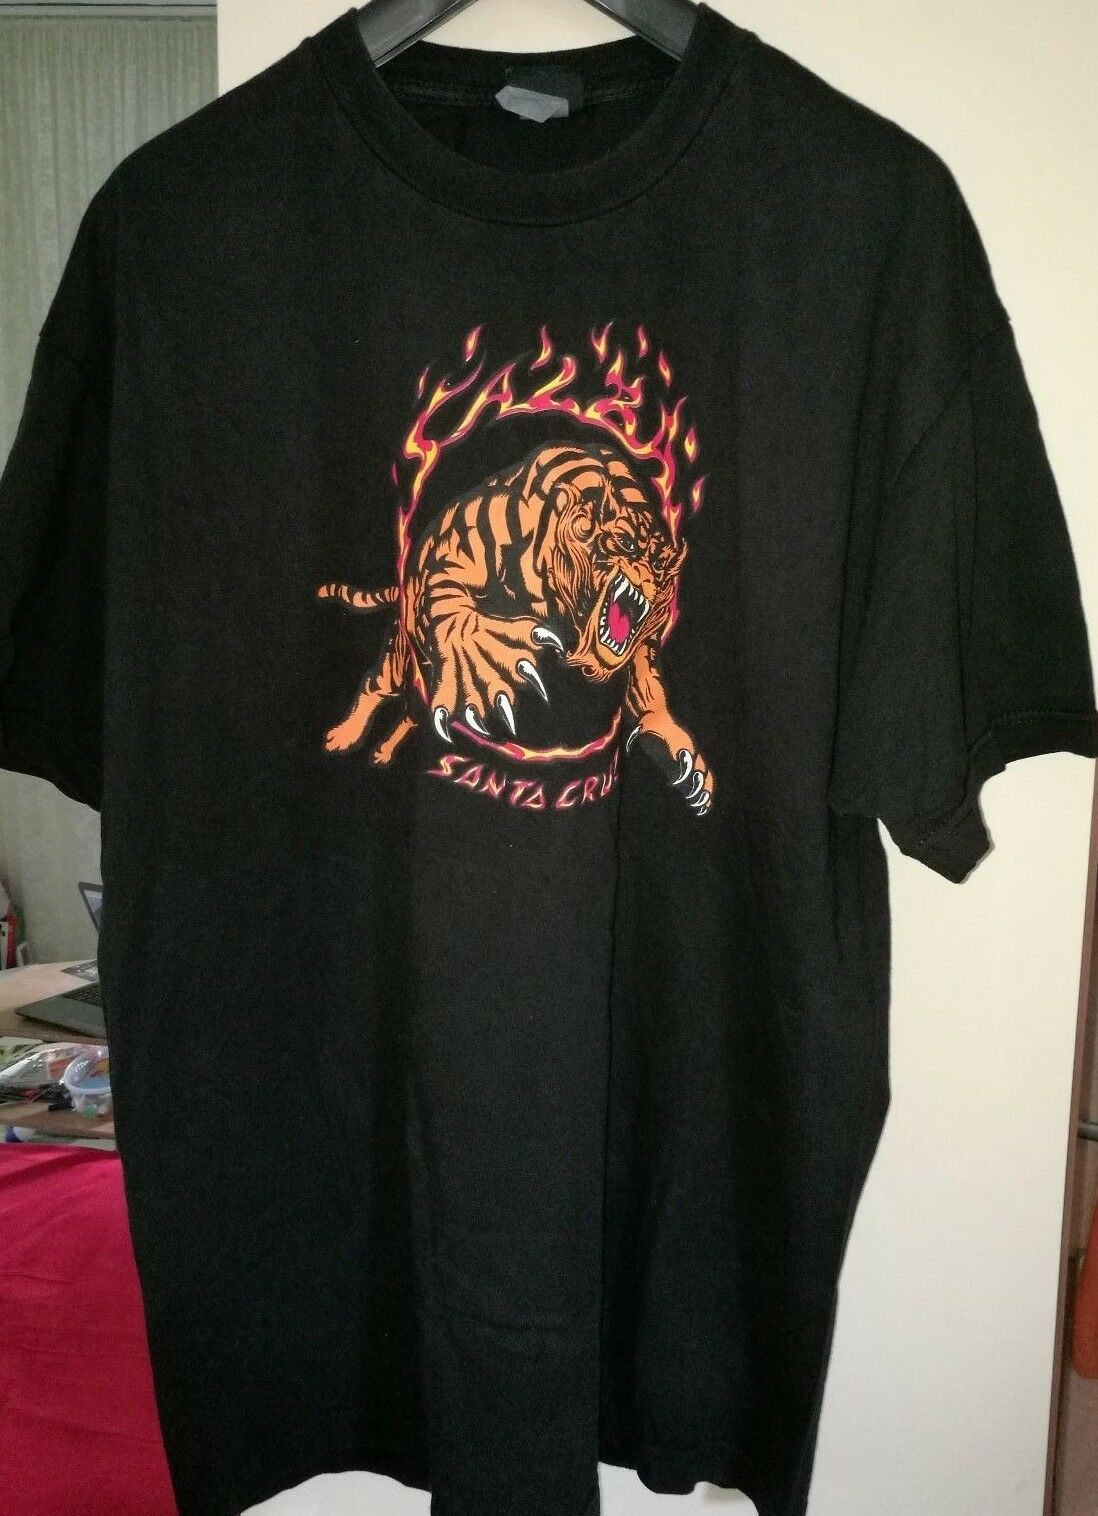 Santa Cruz Steve Salba T - Shirt Gr. XXL / XL schwarz Powell Peralta Vision